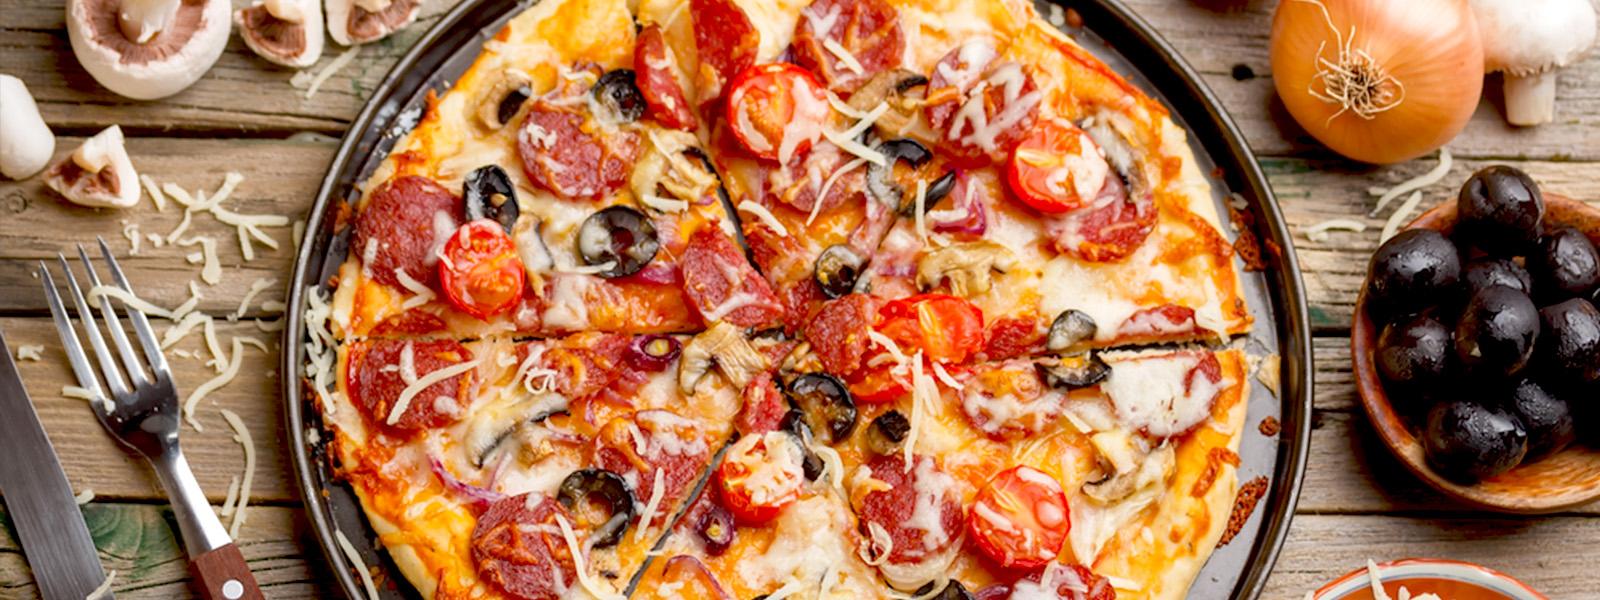 Nefs Pizza Chicken Kebab Nefs Pizza Chicken Kebab